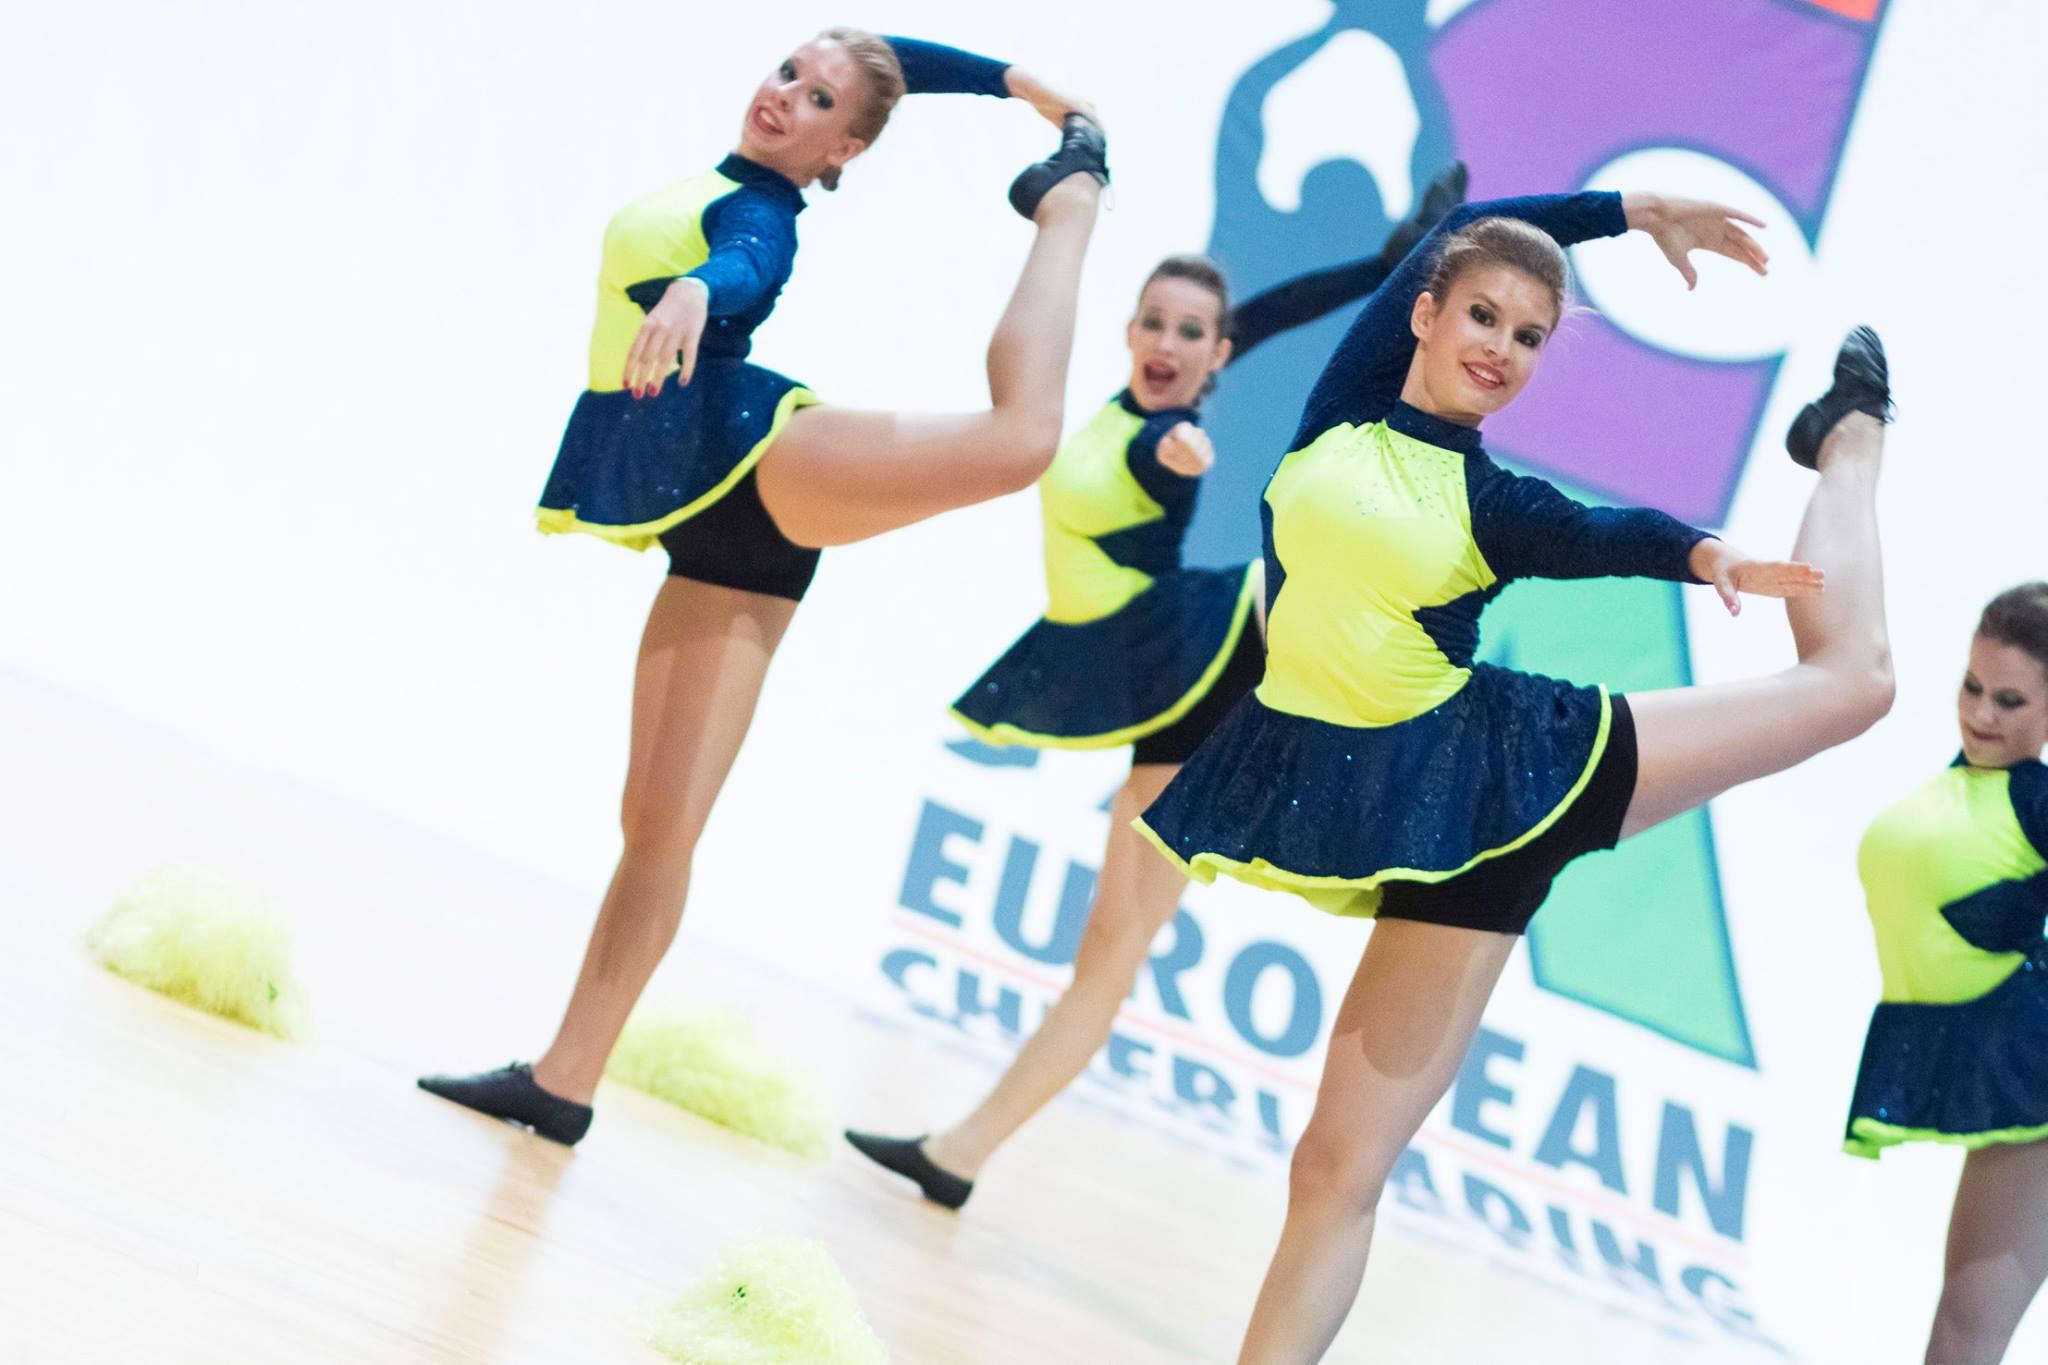 Photo of Cheerleaders Tornadele vrše upis novih članova